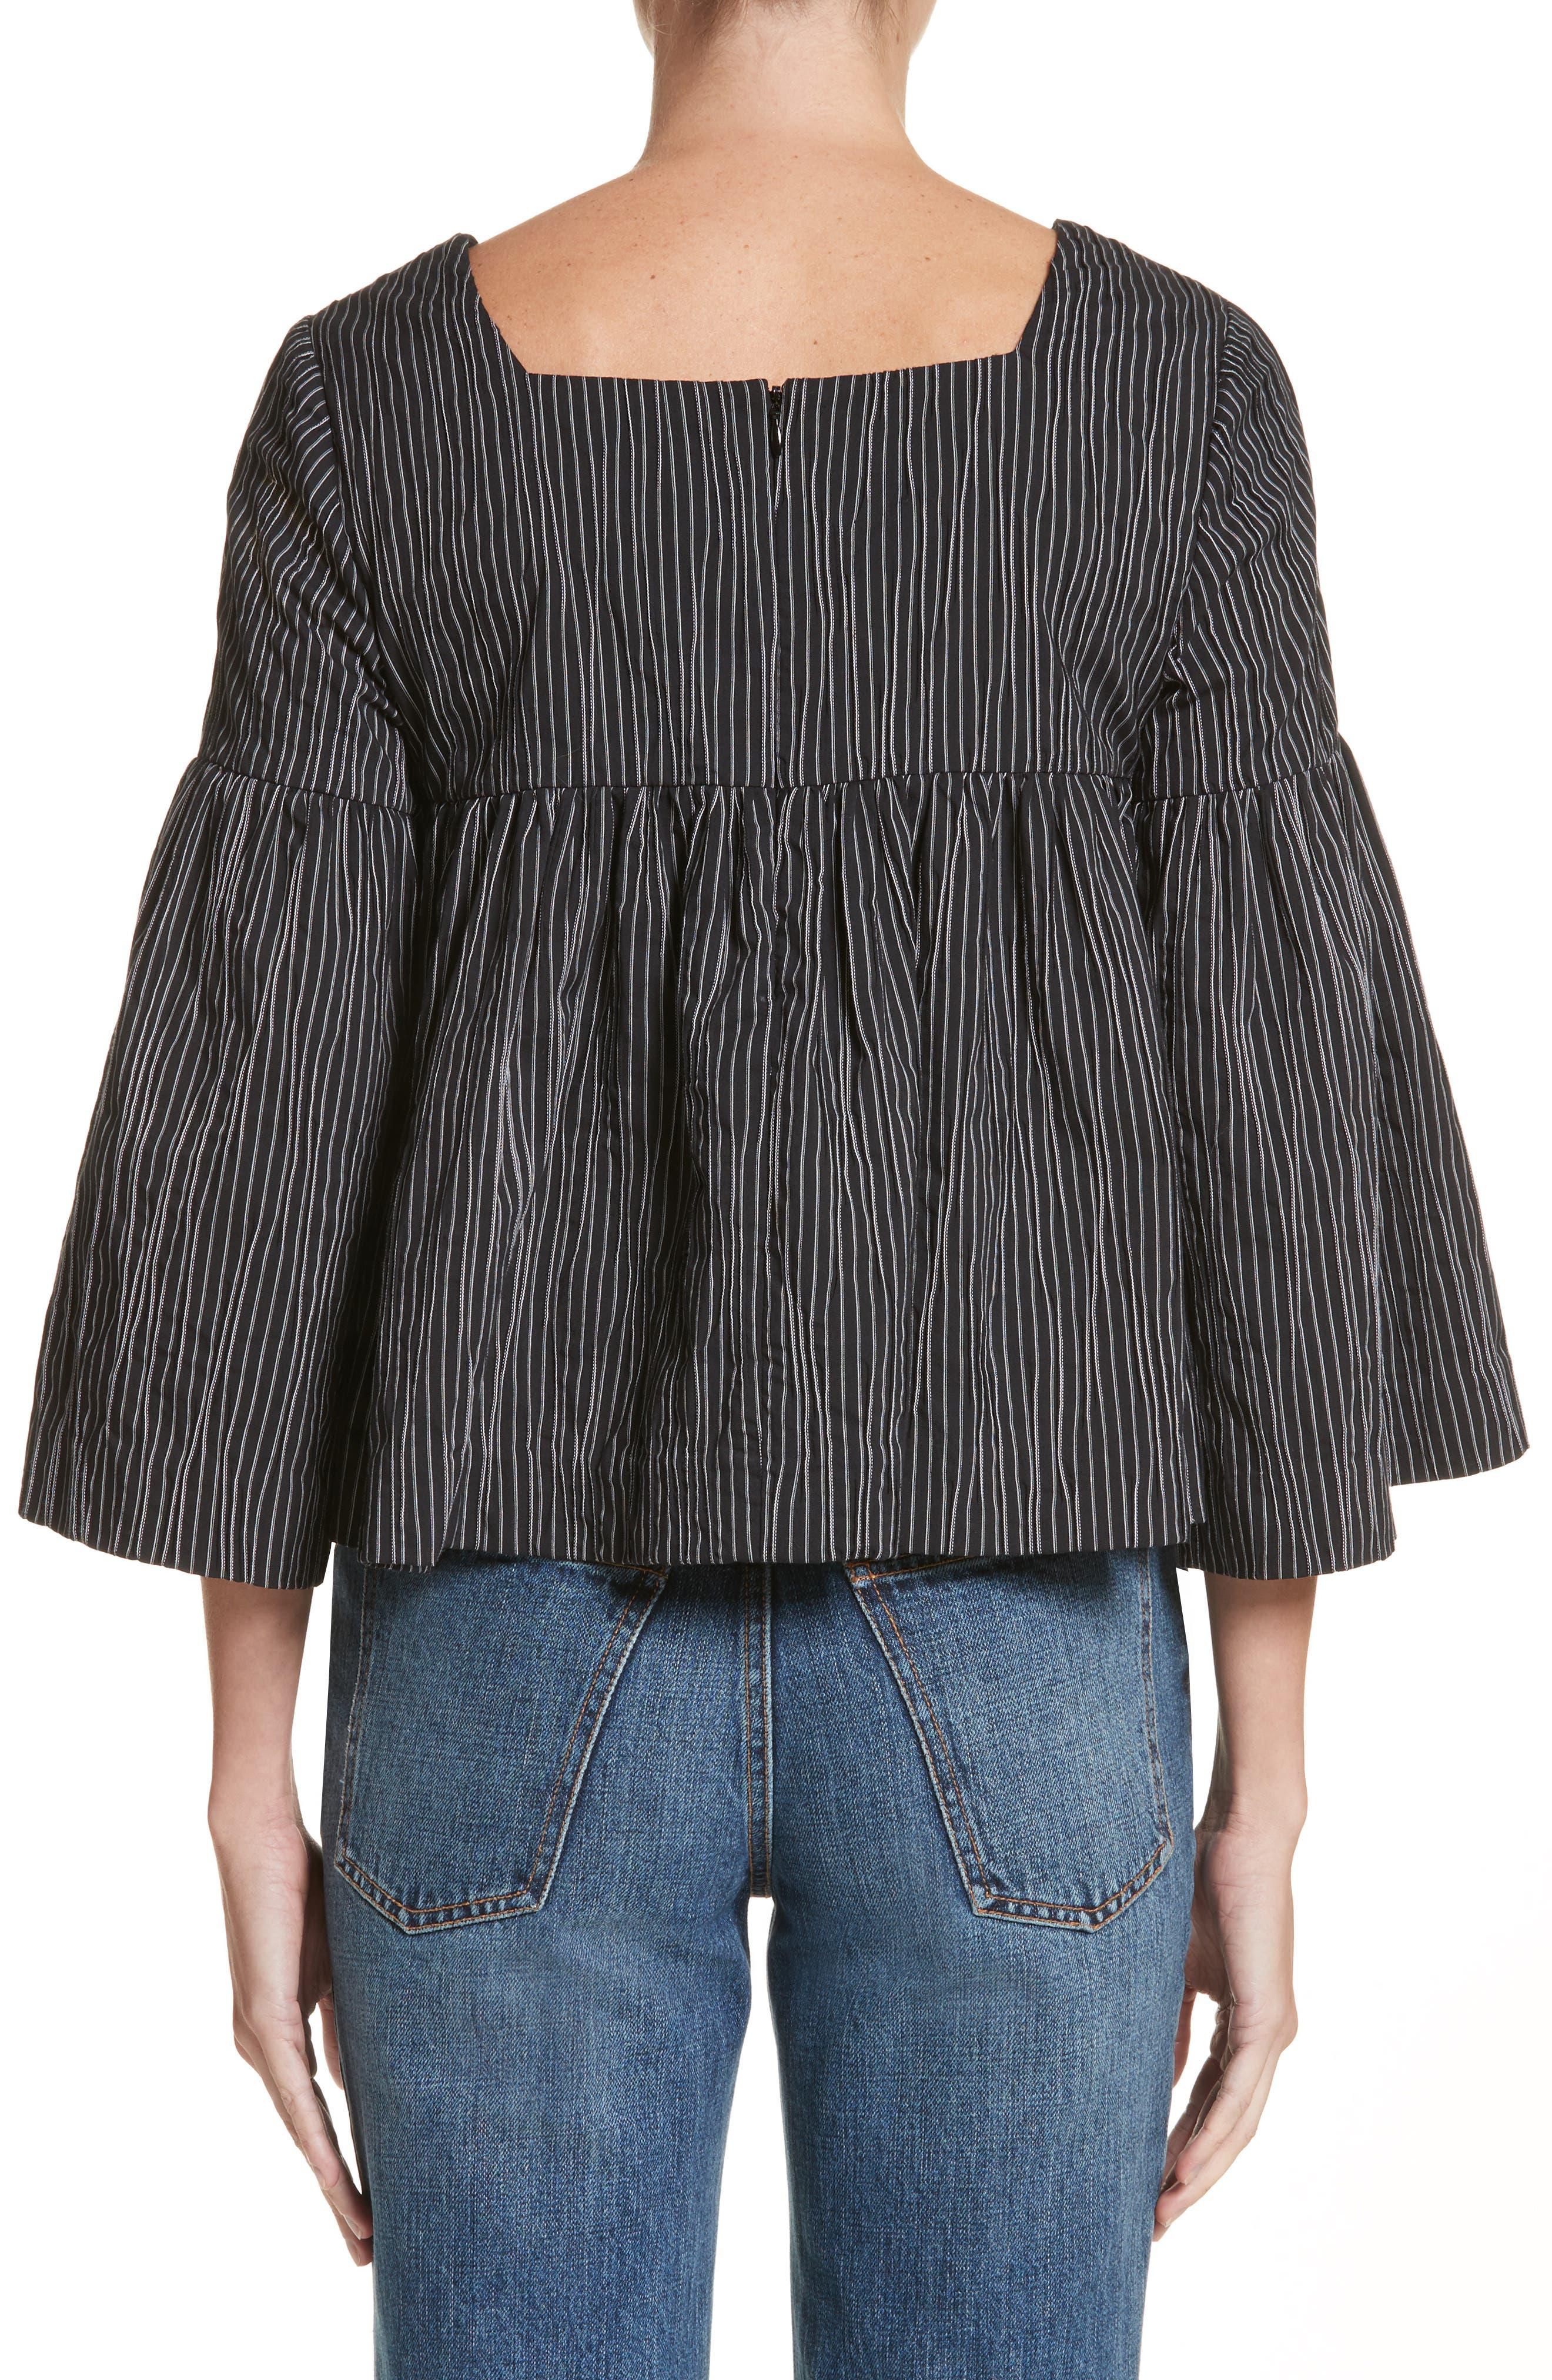 Stripe Crinkle Cotton Blend Swing Top,                             Alternate thumbnail 2, color,                             Black/ White Stripe